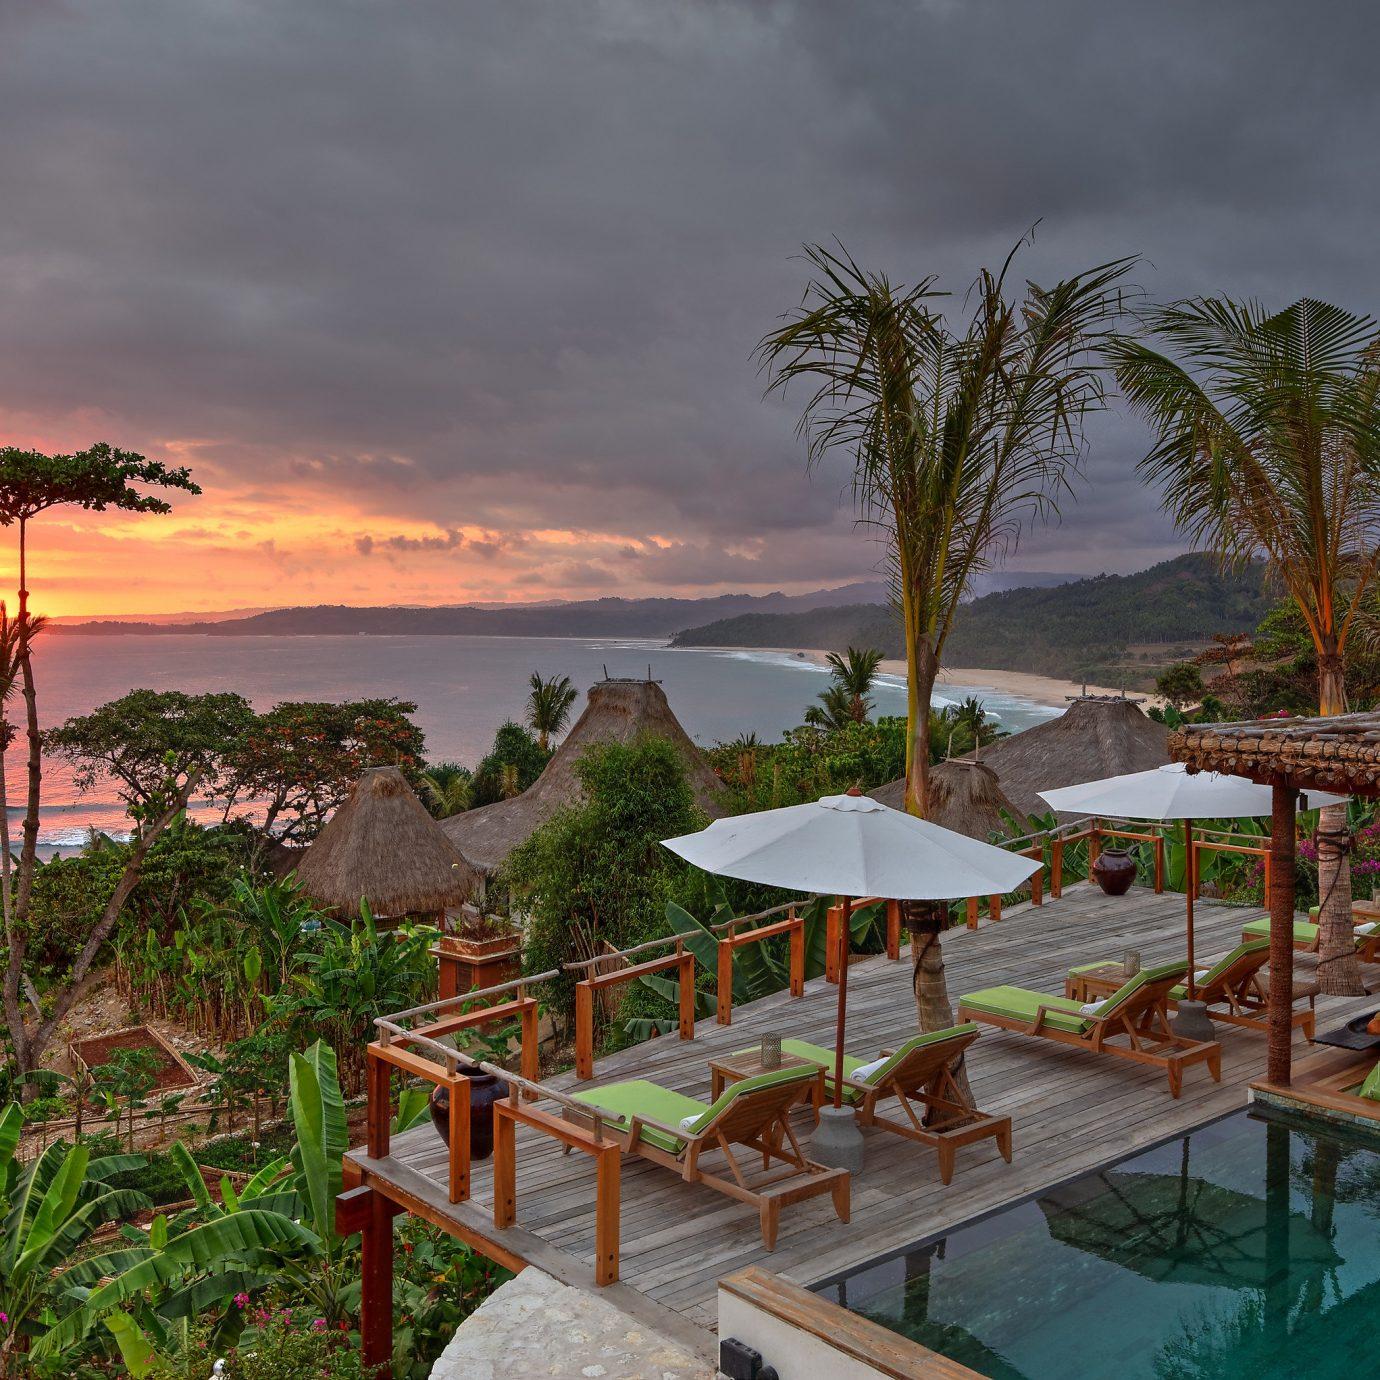 Islands Luxury Travel Trip Ideas sky tree outdoor Resort vacation Ocean arecales tropics Sea estate caribbean Beach Coast bay set colorful several